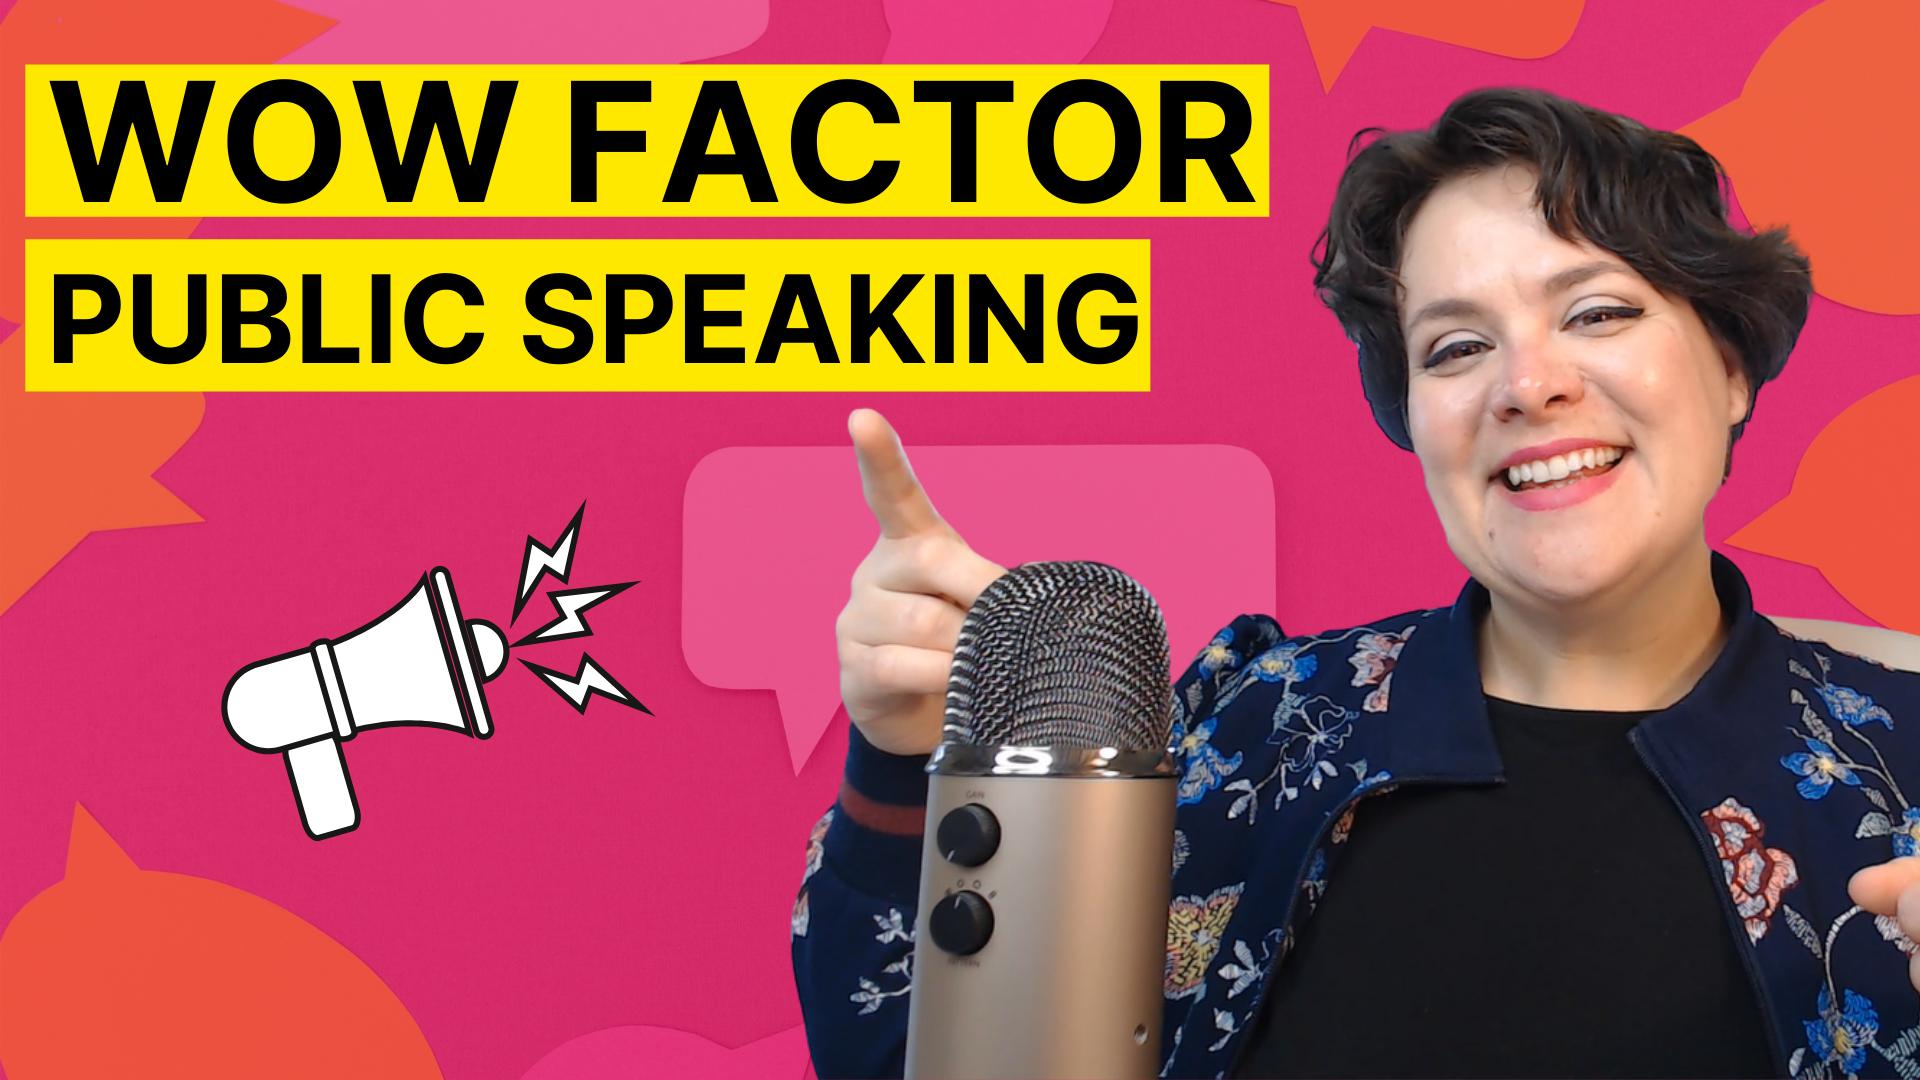 YouTube Thumbnail: Wow Factor Public Speaking